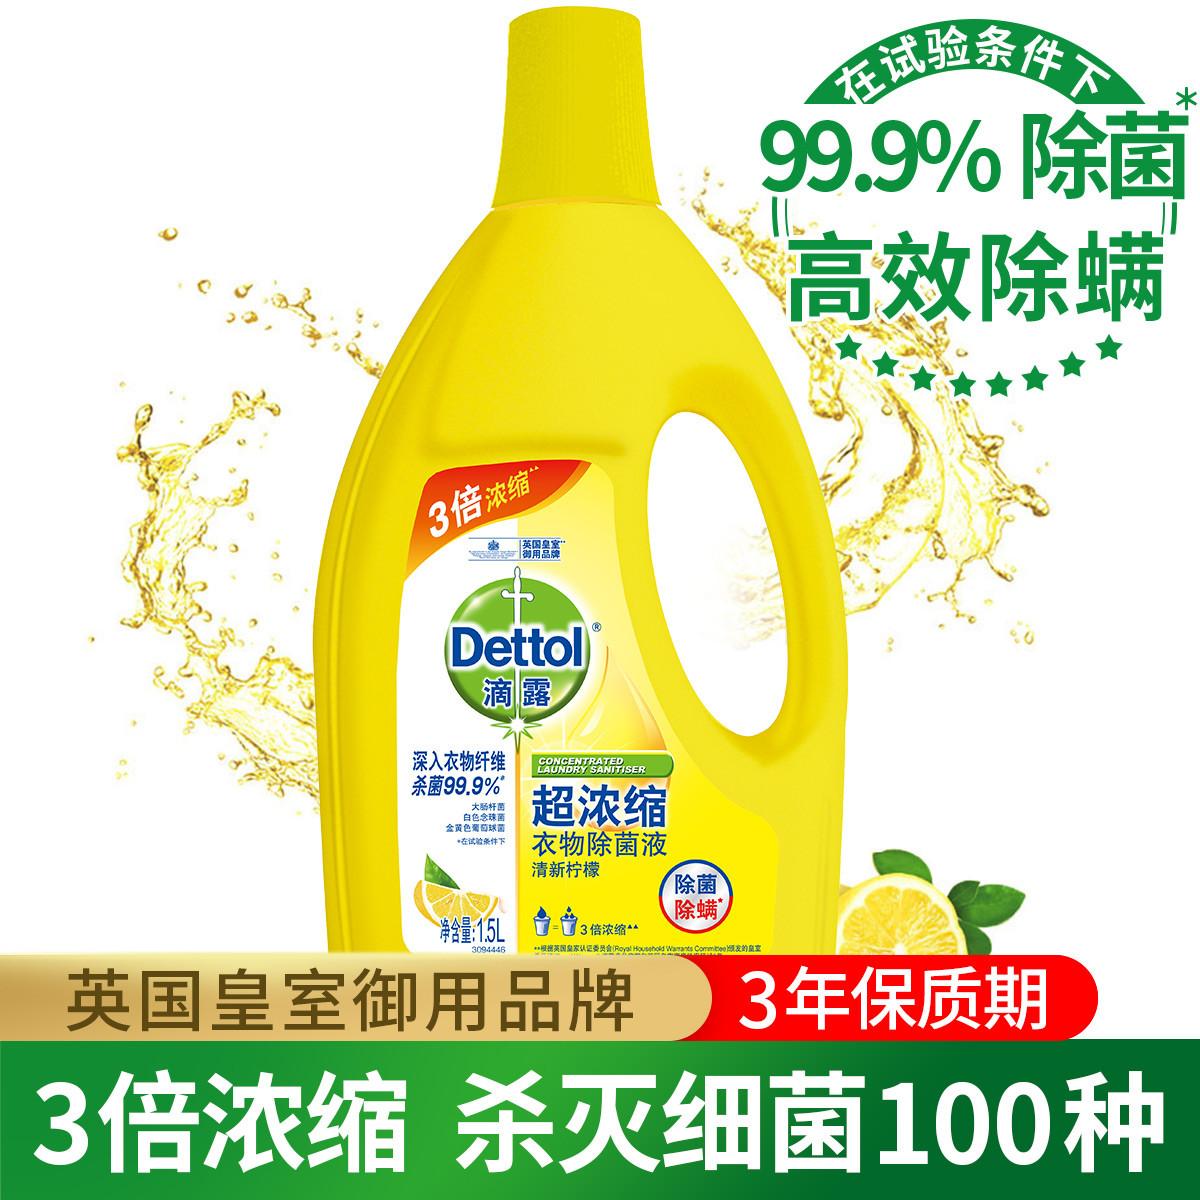 Dettol 【3倍浓缩省心省地】杀灭细菌100种 滴露超浓缩衣物除菌液1.5L